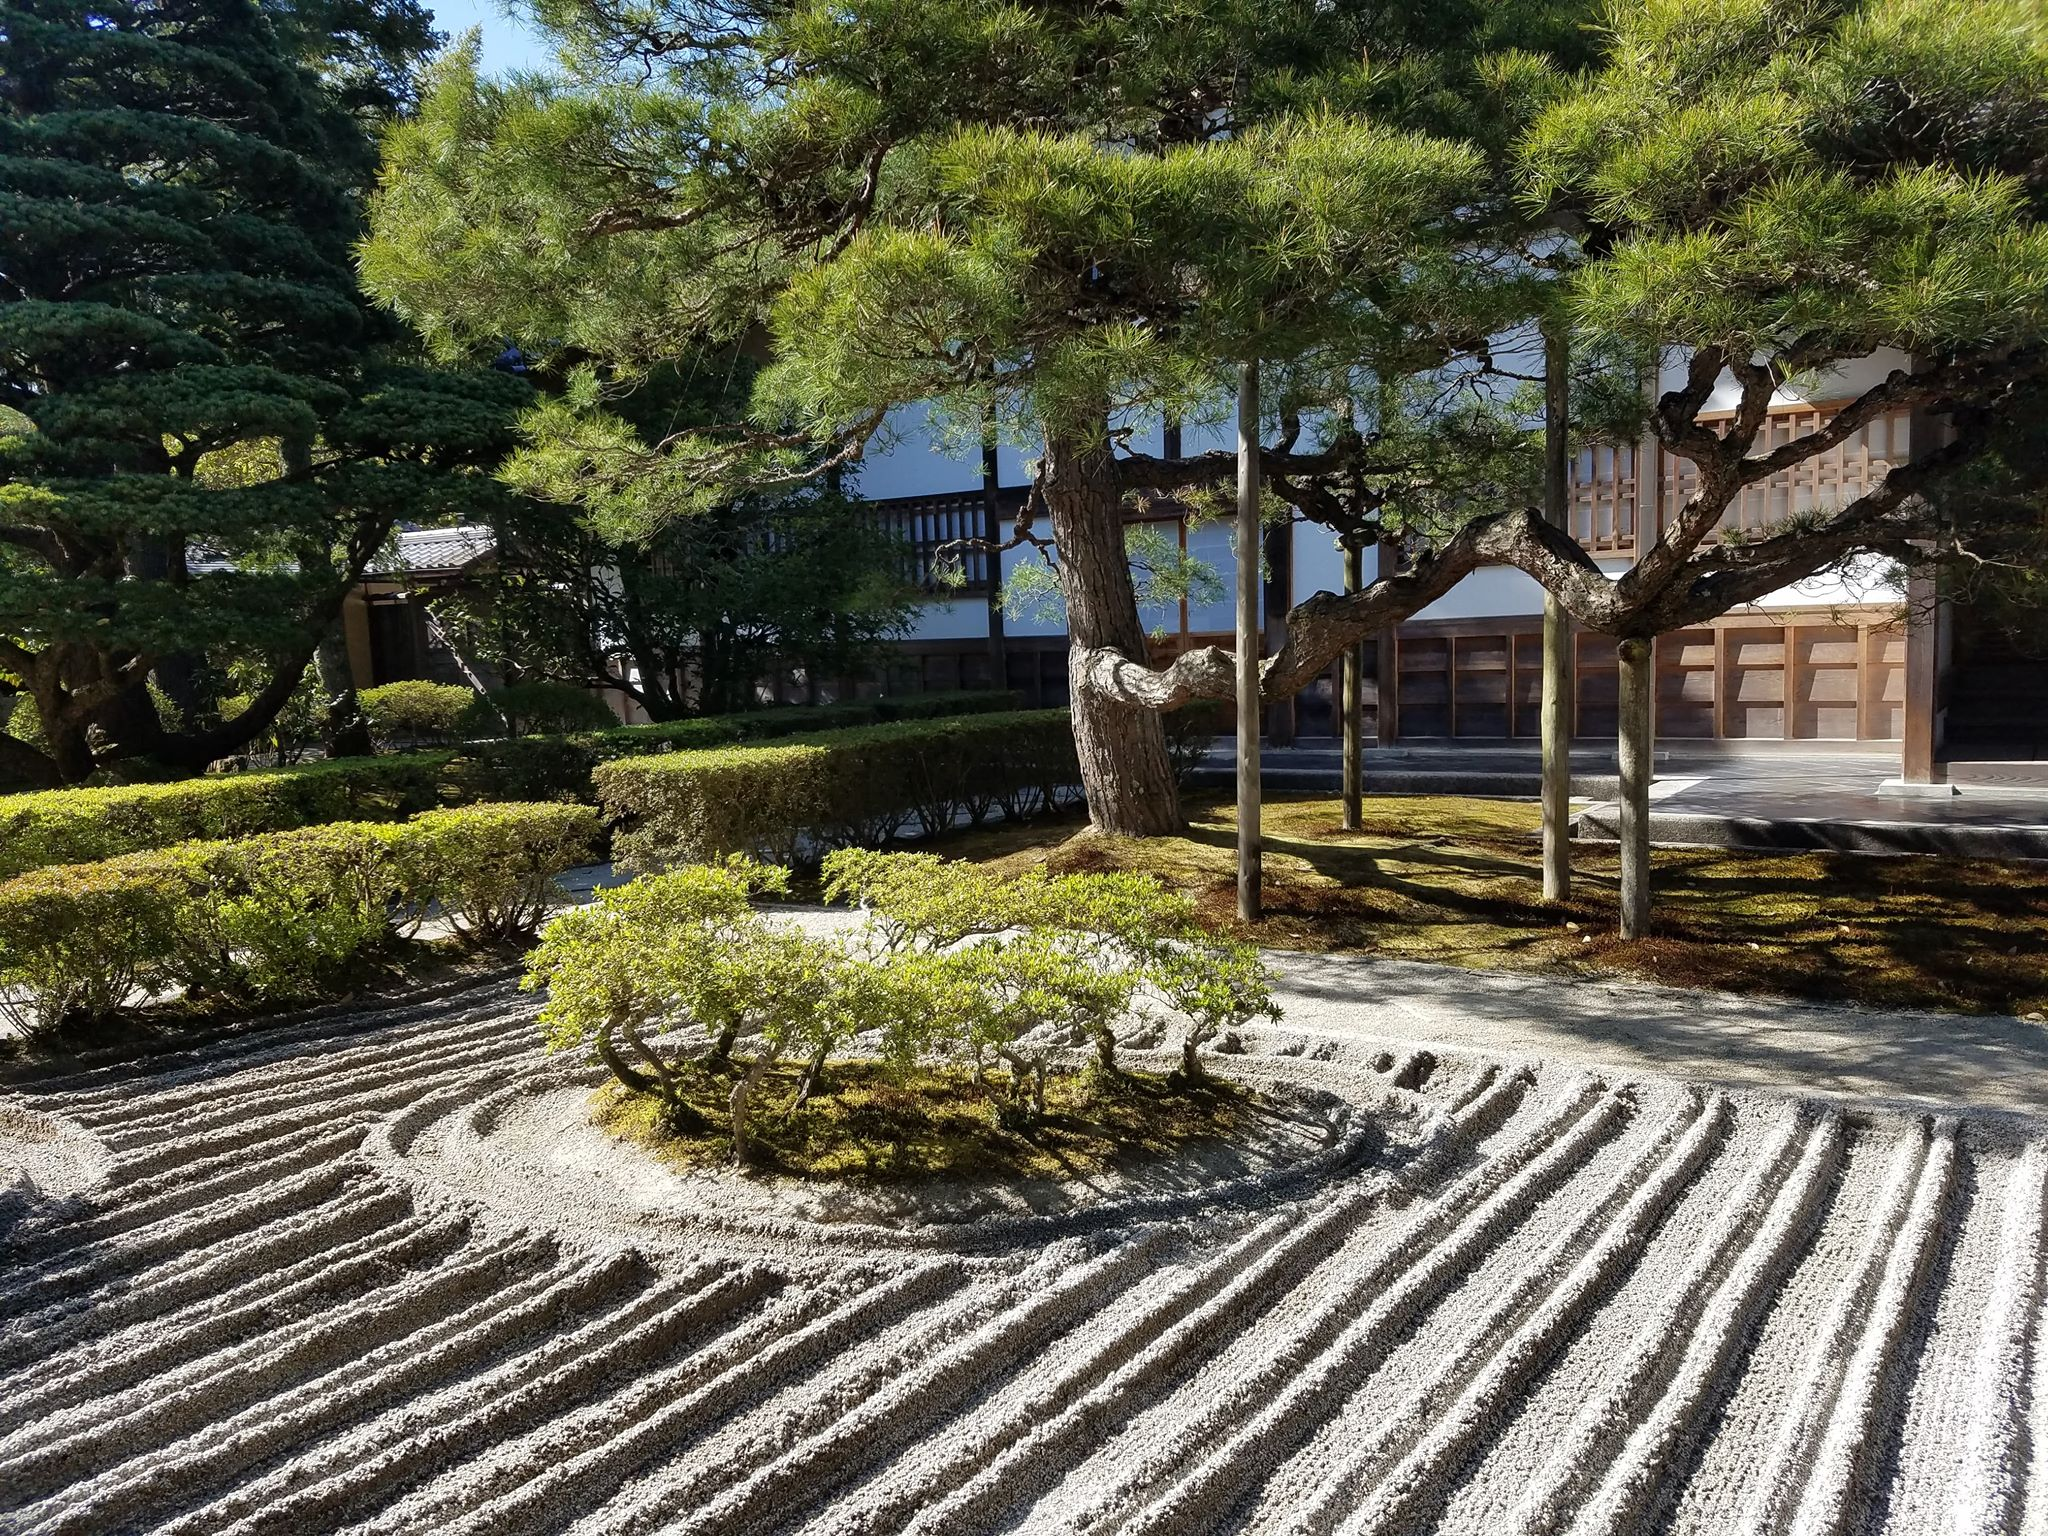 Sand and Stone garden in Ginkakuji (Silver Pavilion), Kyoto